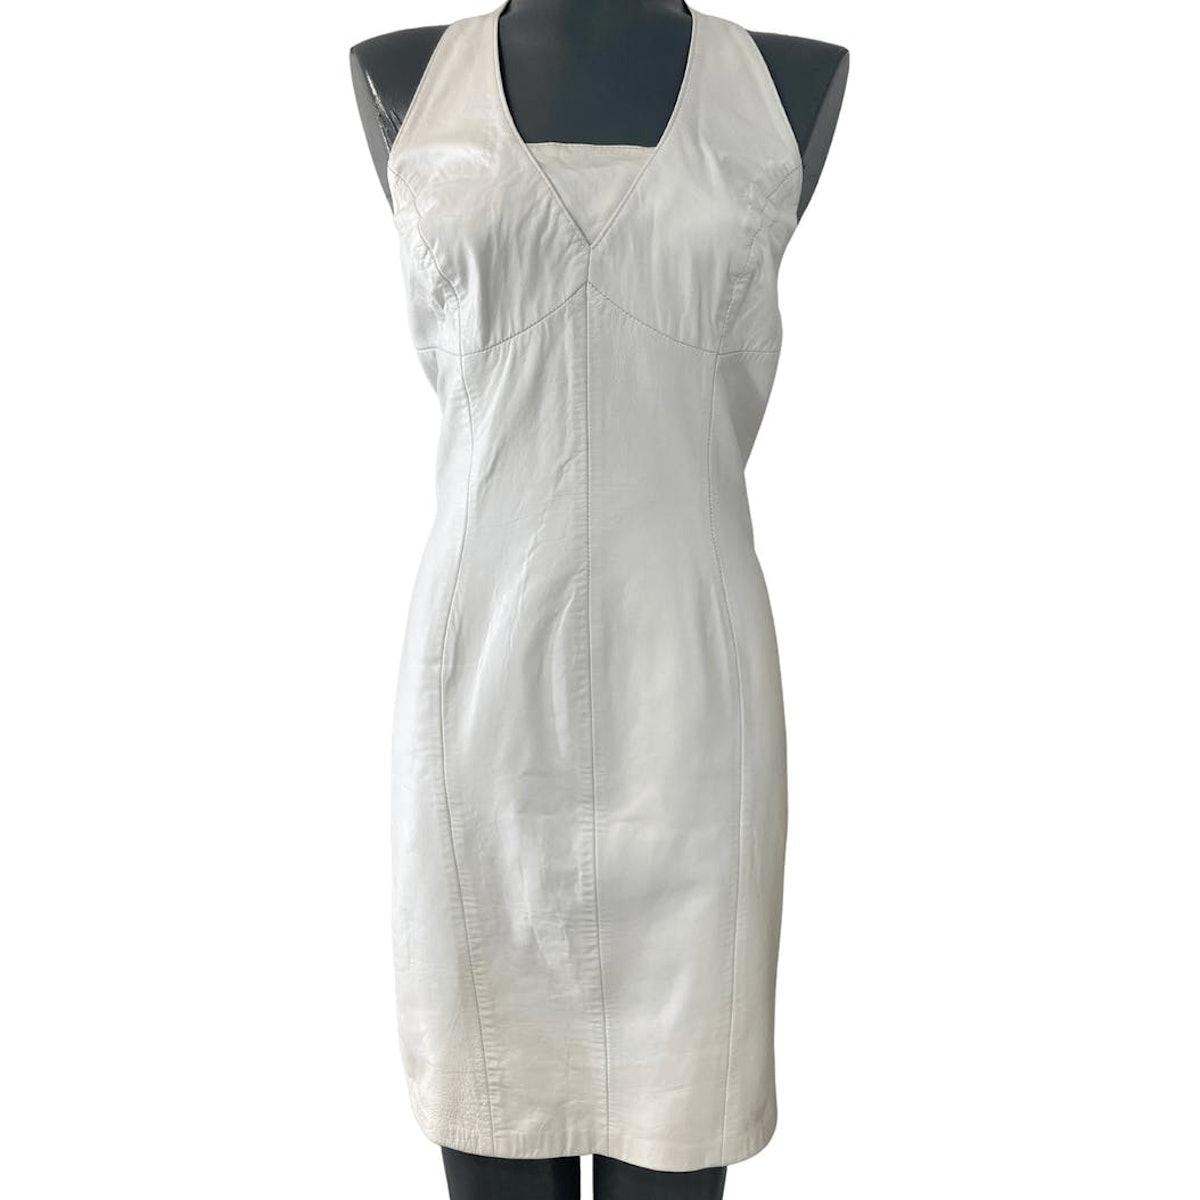 90's White Leather Halter Top Dress Hugo Buscati